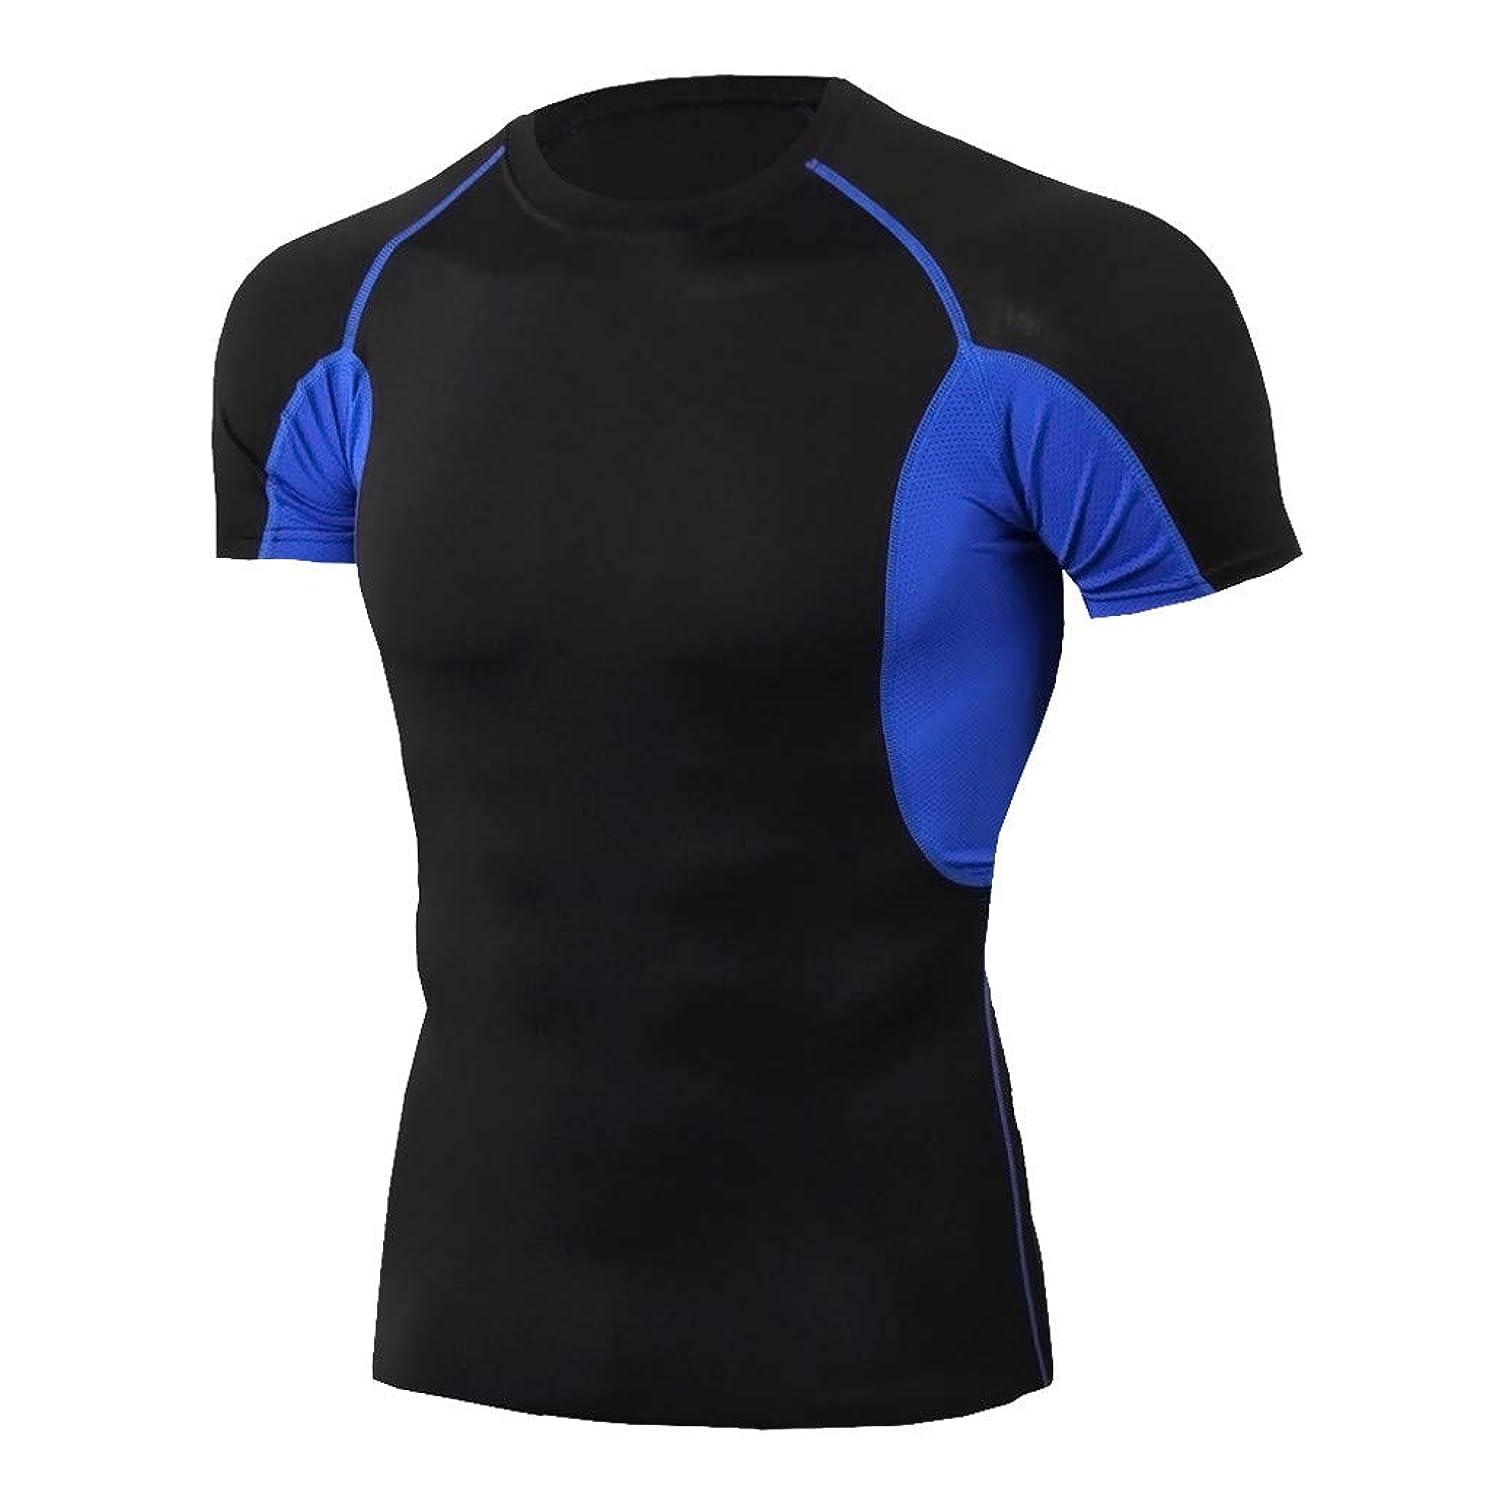 YAYUMI 2019 Men Workout Short Sleeve Fitness Sports Running Yoga Athletic Shirt Top Blouse